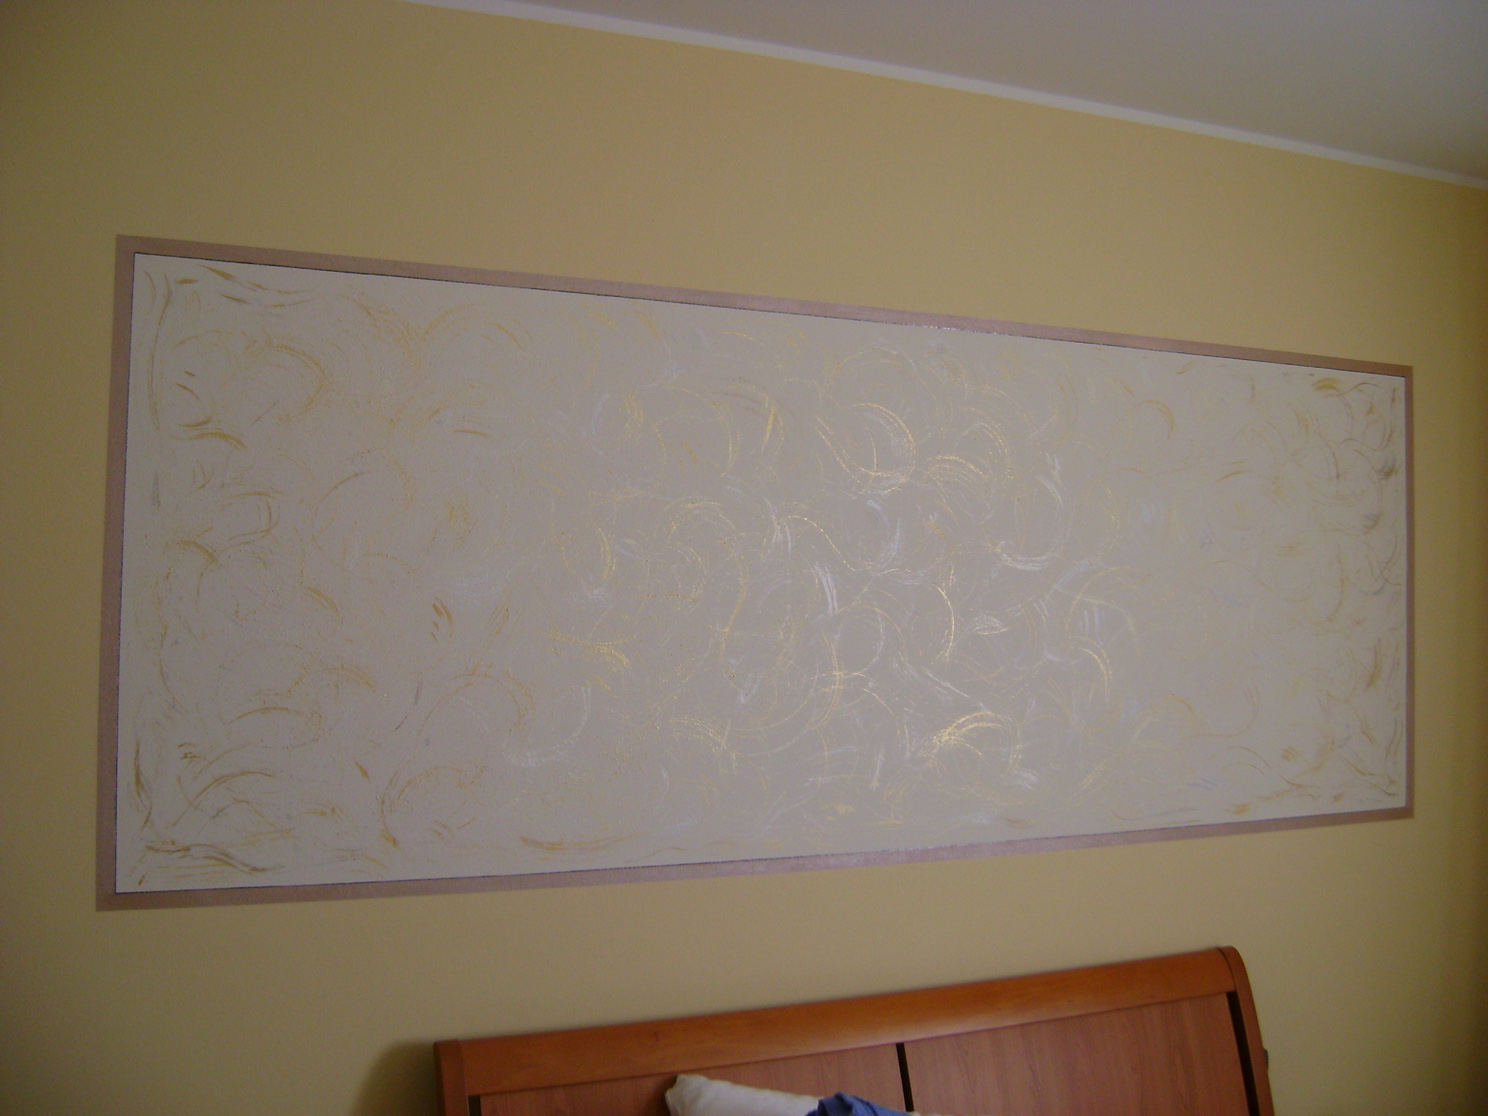 Dipintore decoratore dipinture per interni - Gamma colori interni casa ...